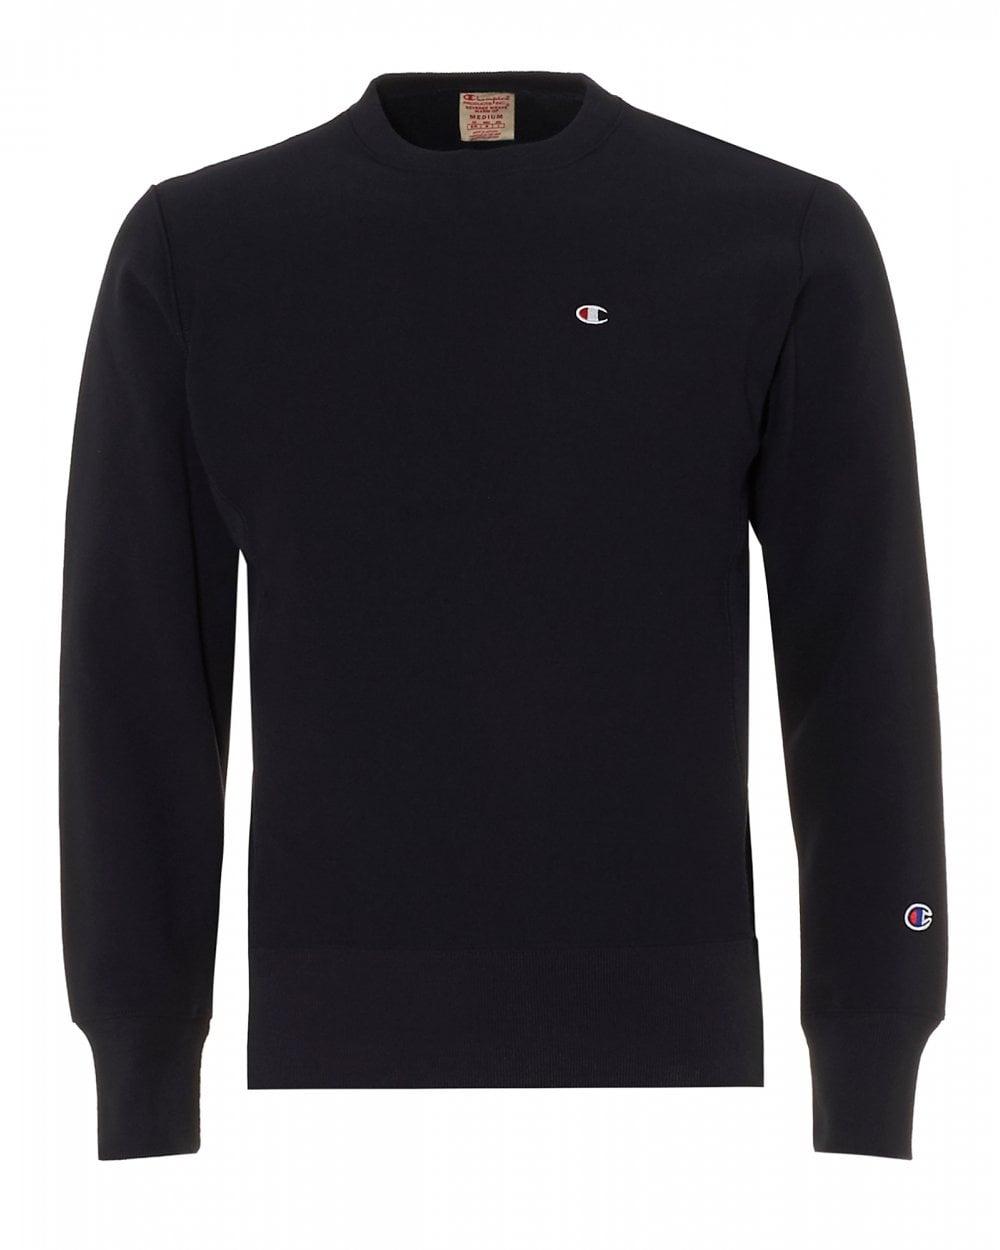 18880905 Champion Mens Small Logo Sweatshirt, Navy Blue Crew Neck Sweat